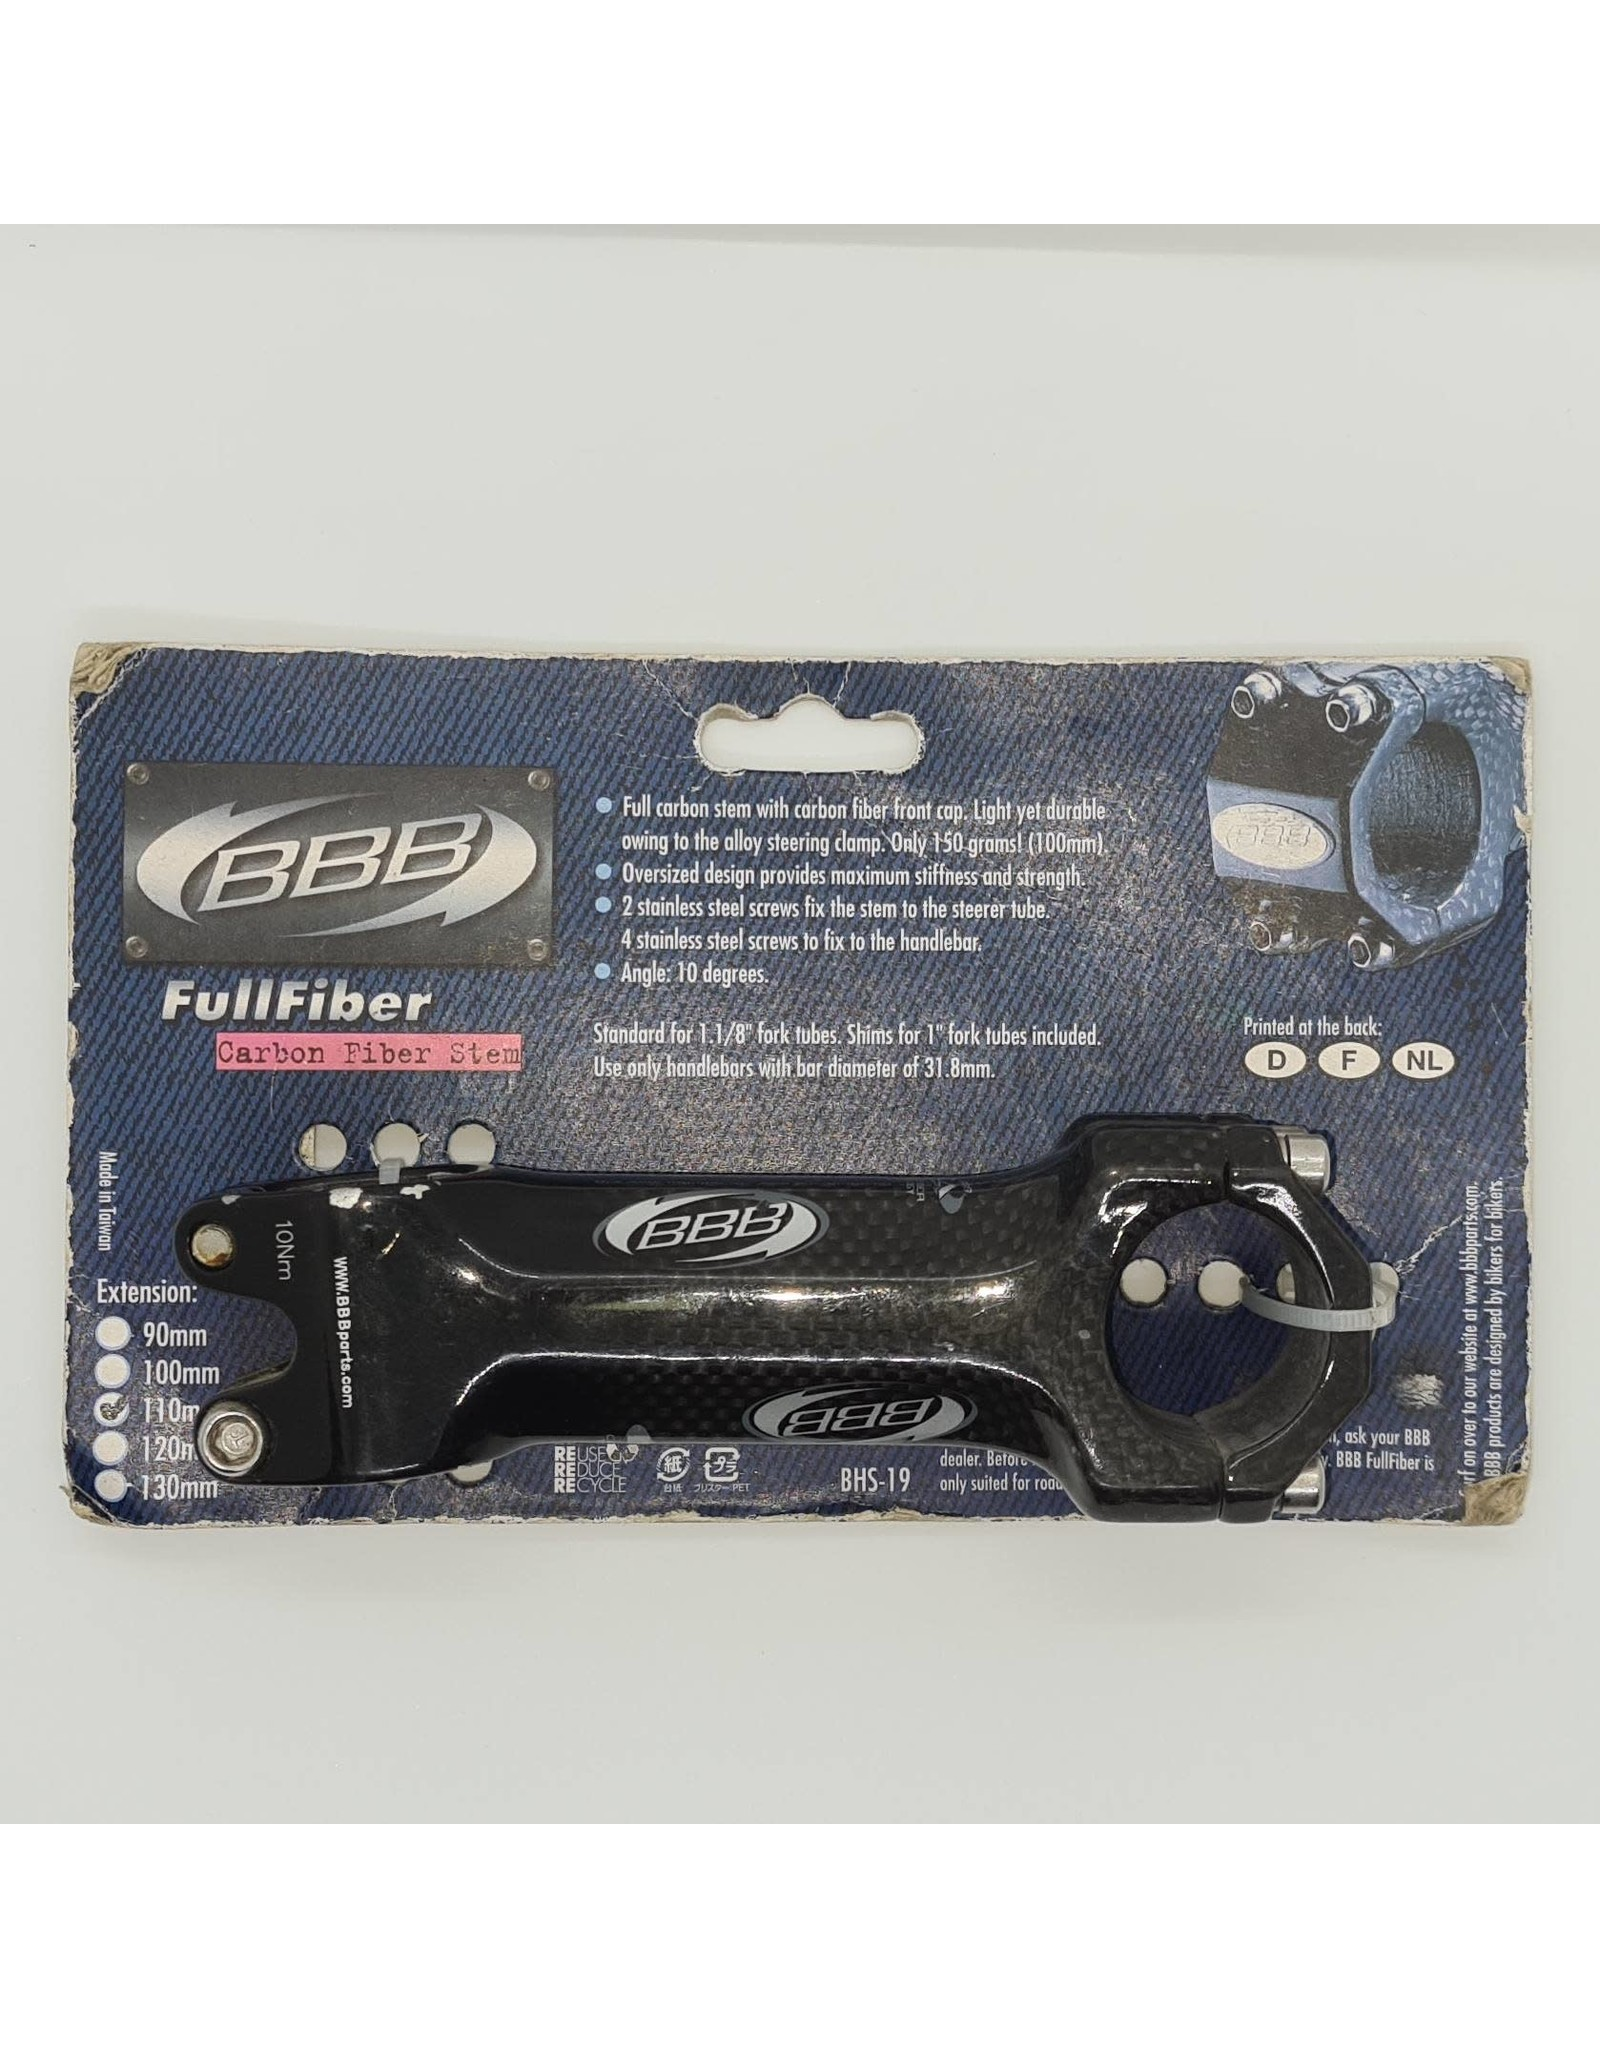 BBB CLEARANCE FULLFIBER CARBON FIBER STEM 31.8 110MM